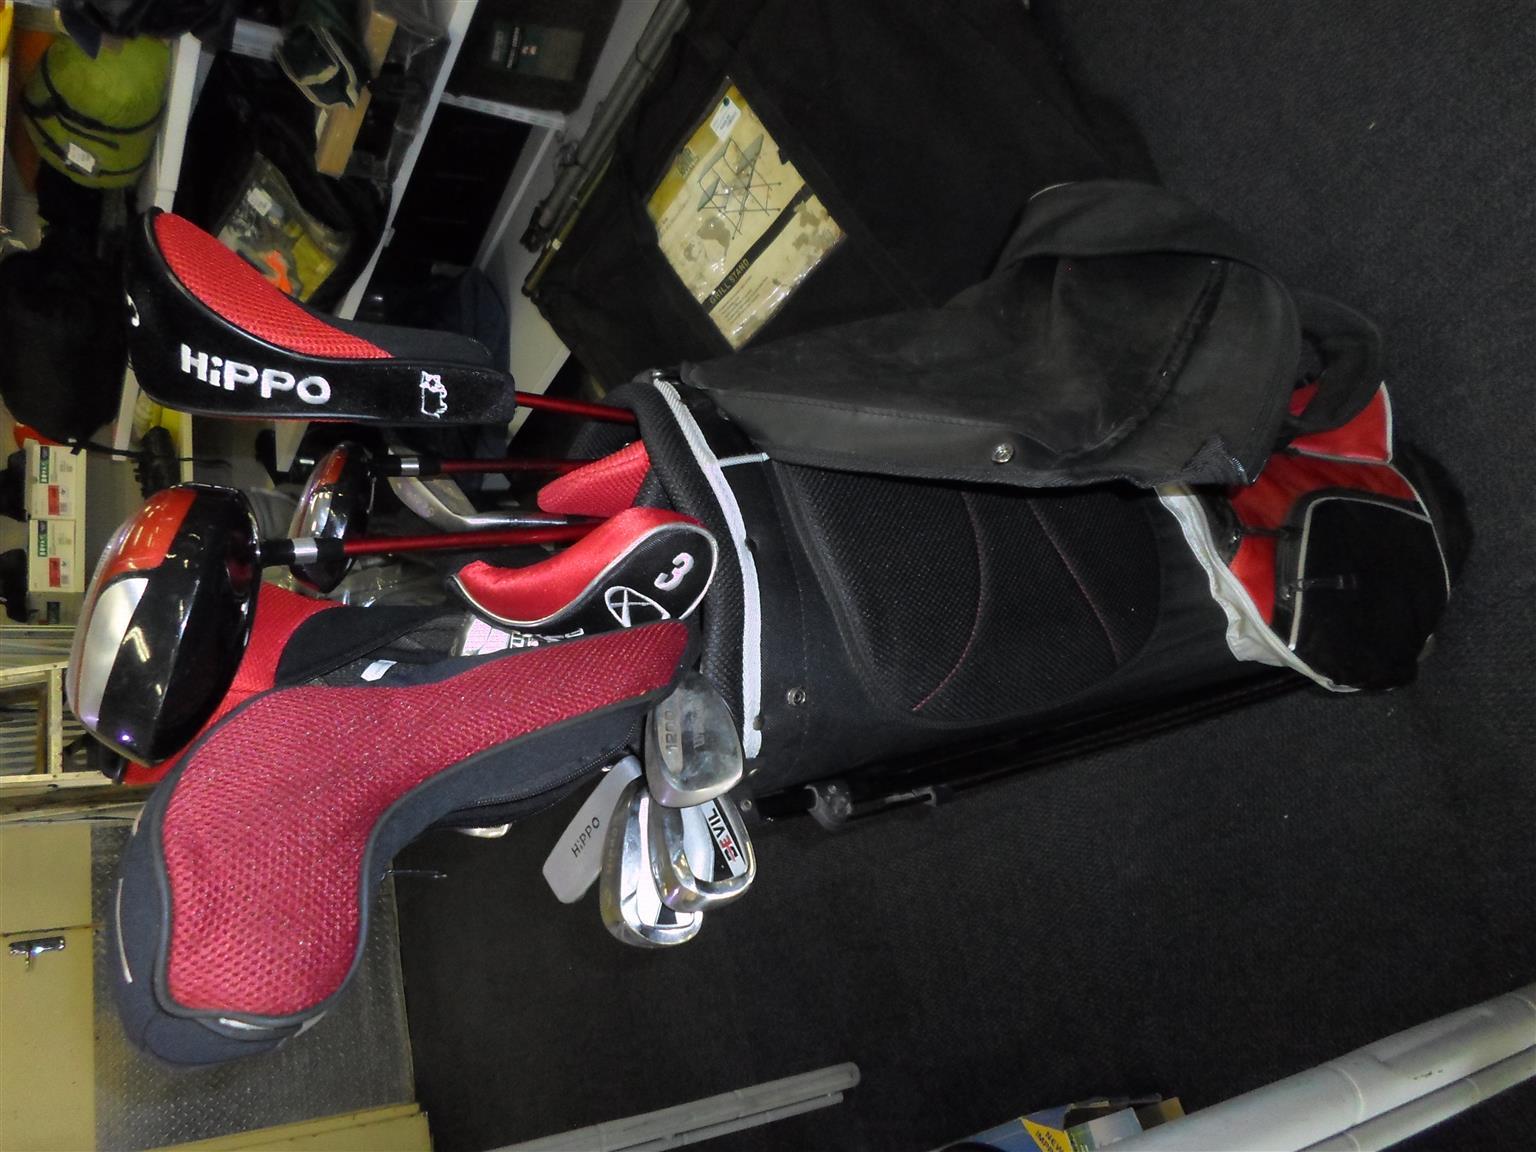 Set of 13 Hippo Golf Set